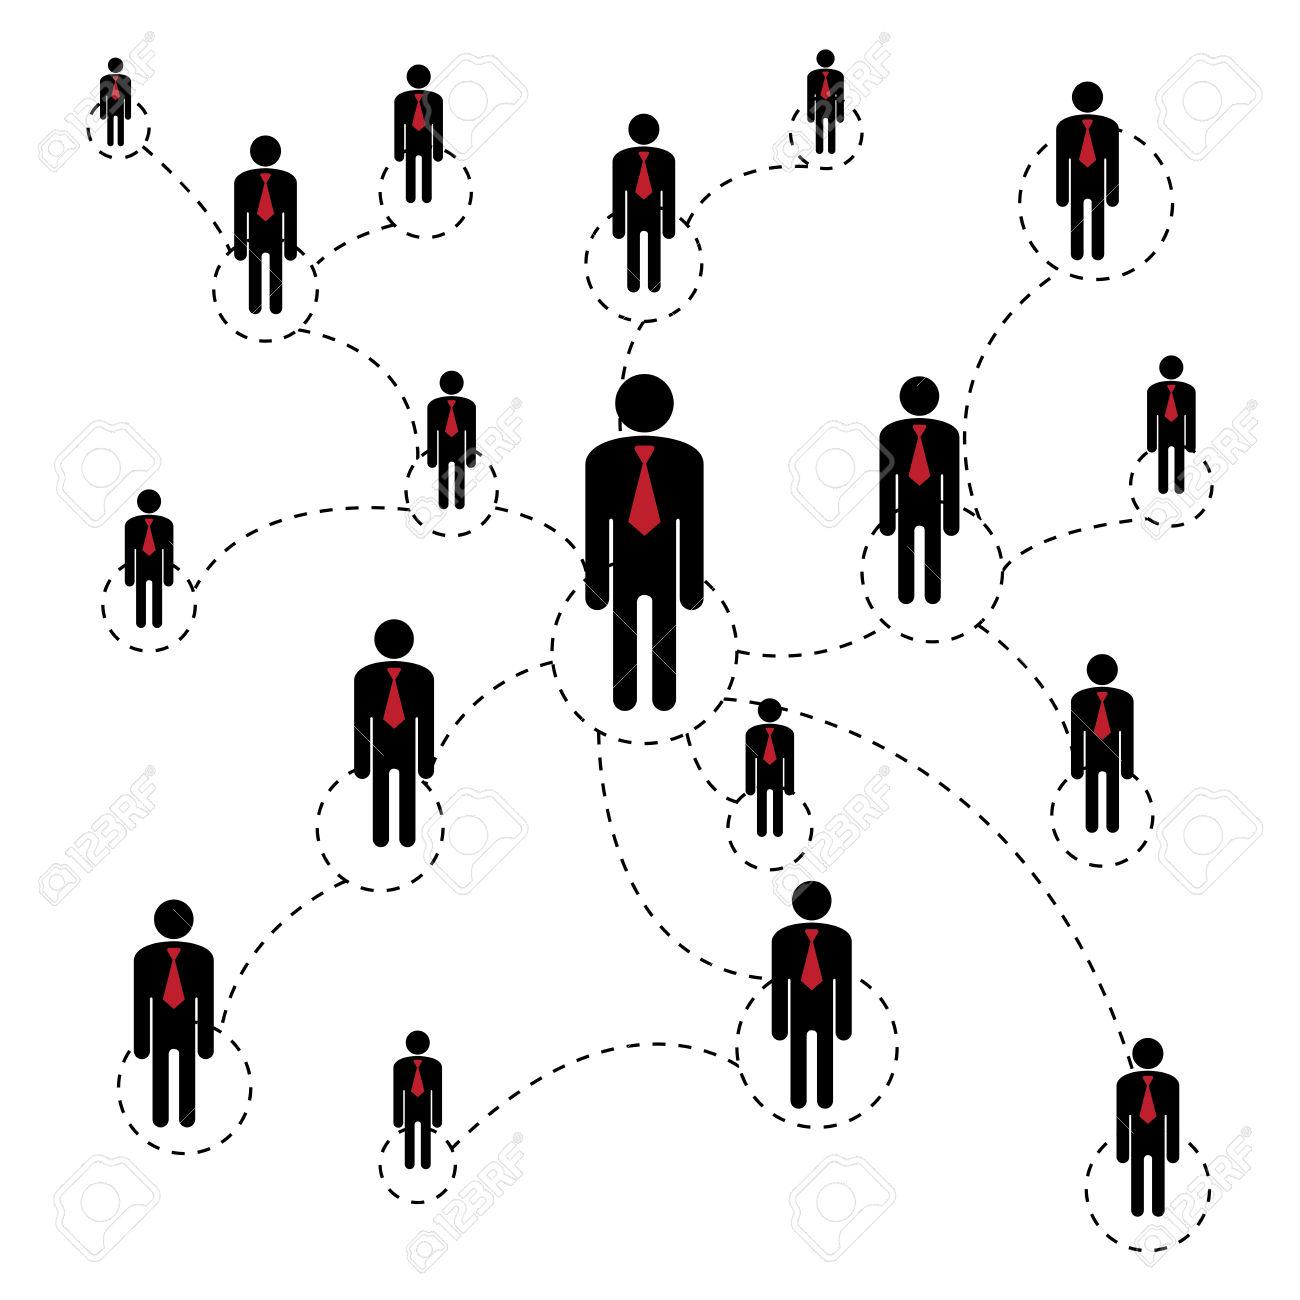 6 Jurus Membangun Network